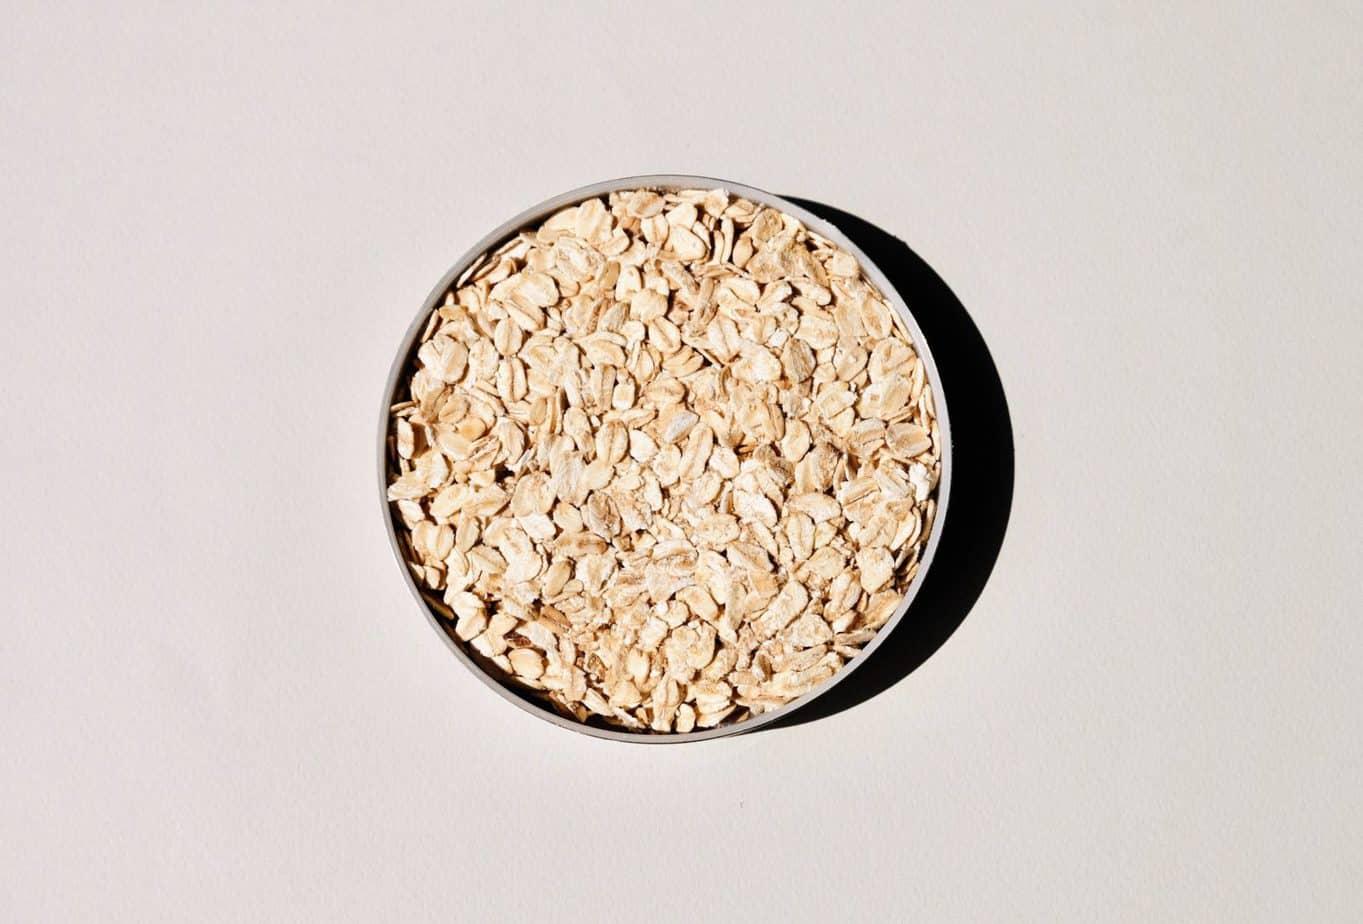 is oatmeal vegan?